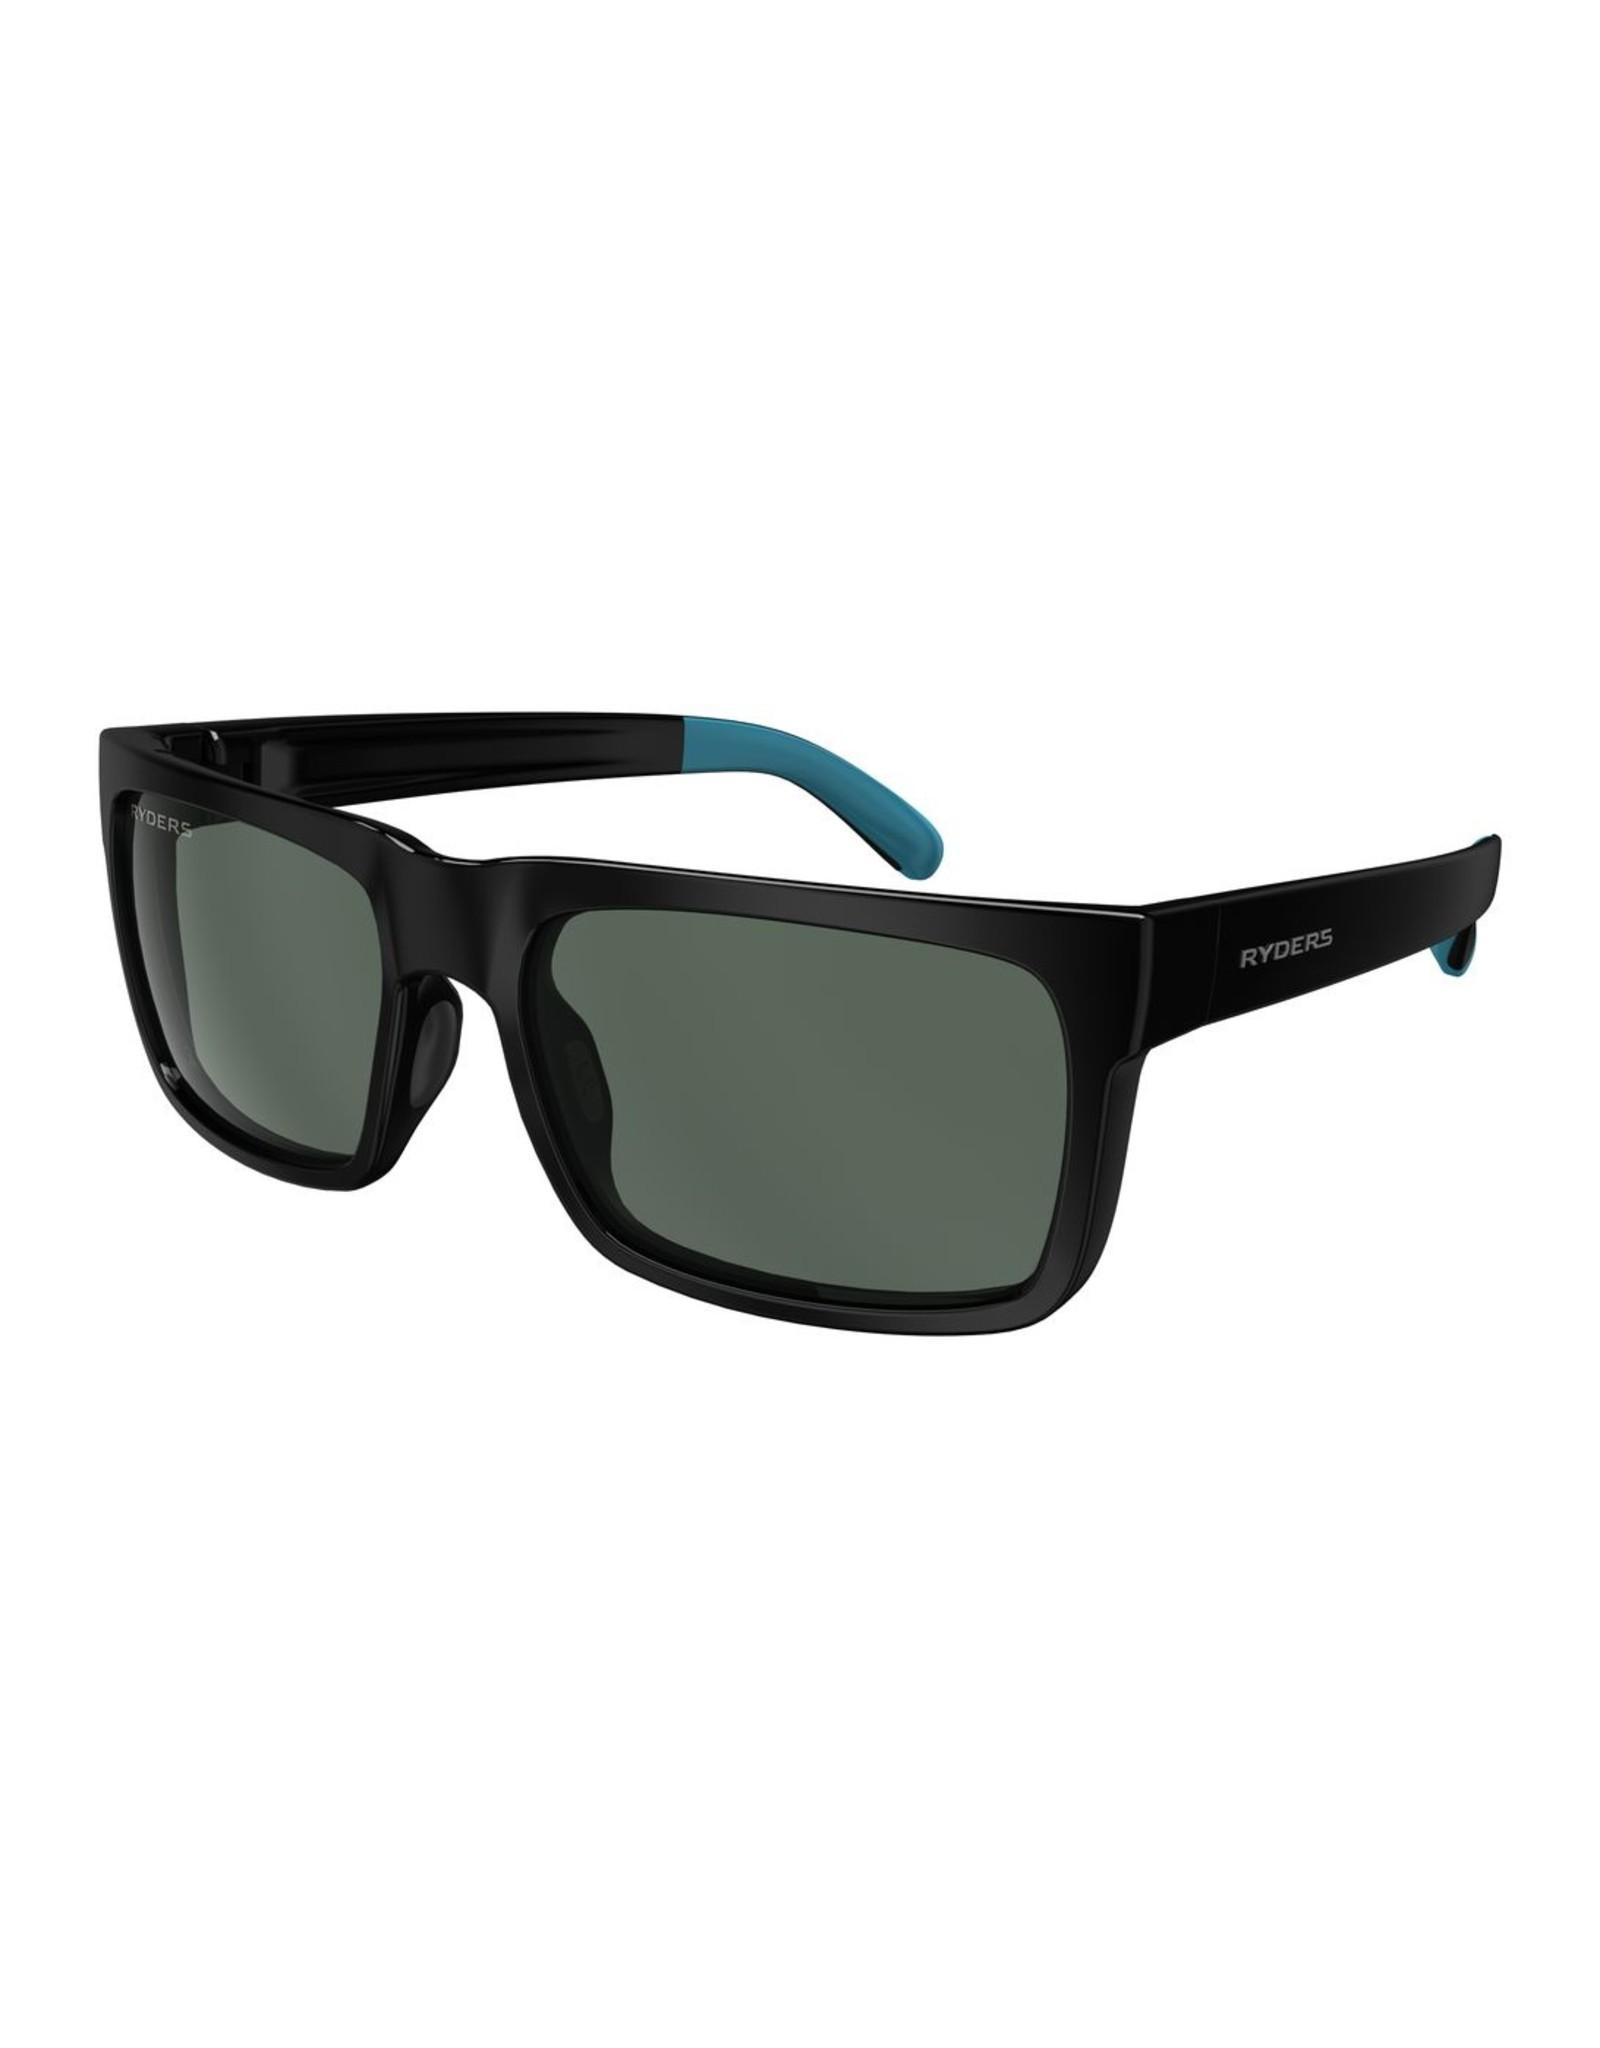 Ryders Eyewear - Pemby Polar Black - Blue/Green Lens